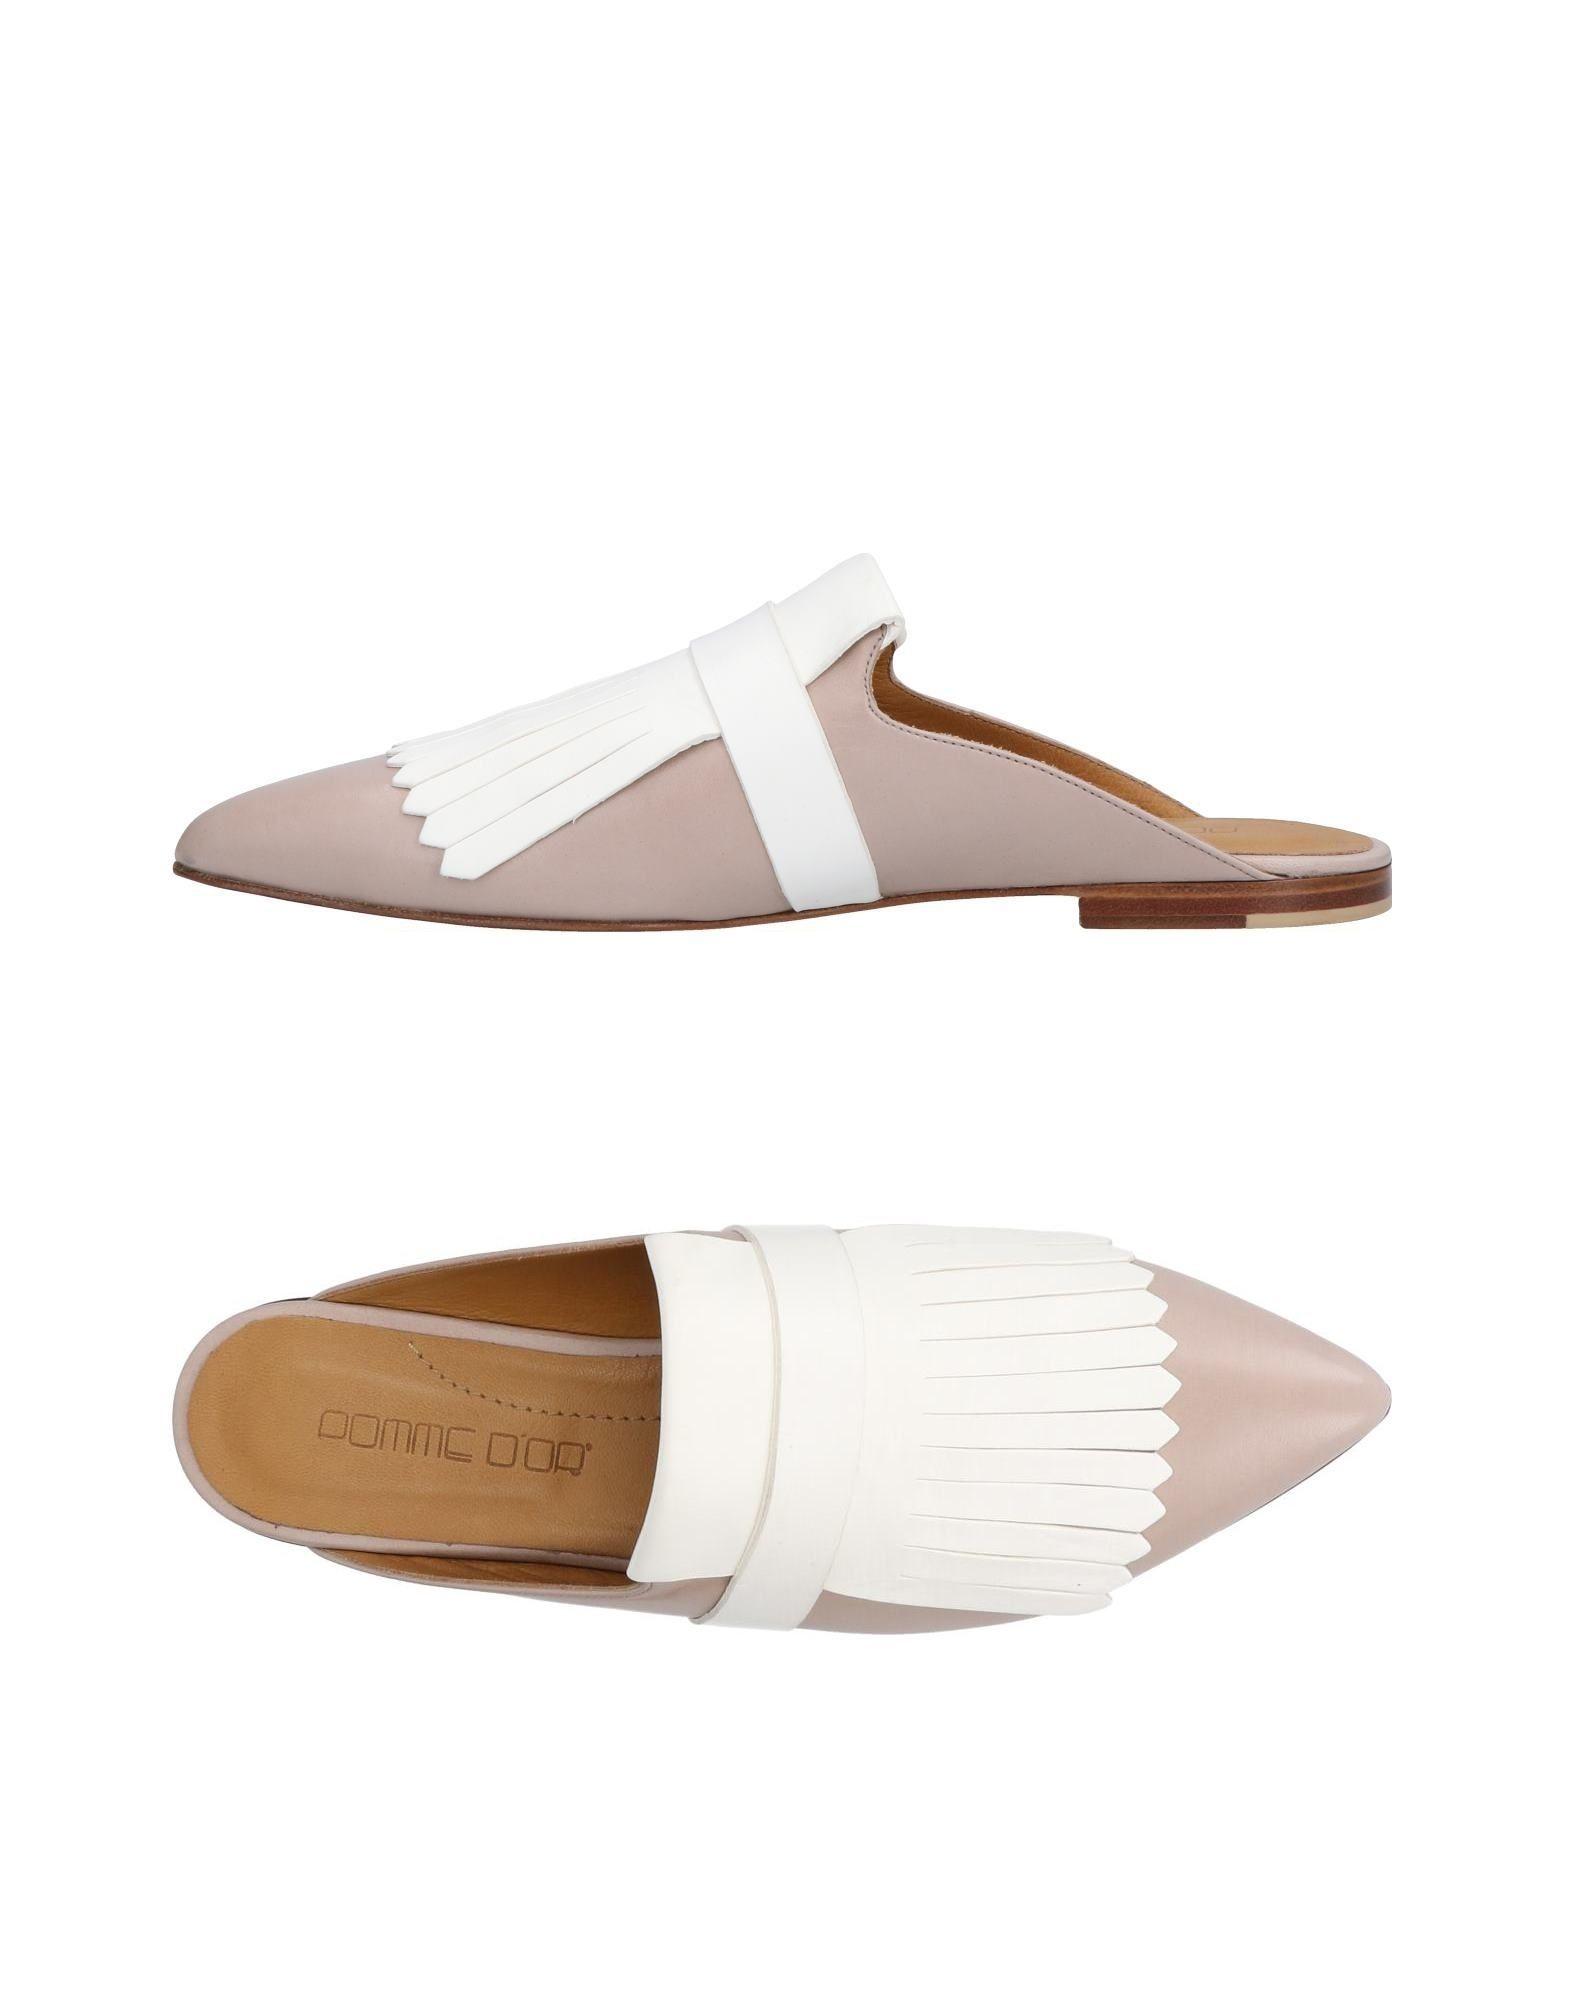 Stivaletti Calpierre offerte Donna - 11539873ER Nuove offerte Calpierre e scarpe comode 458b07